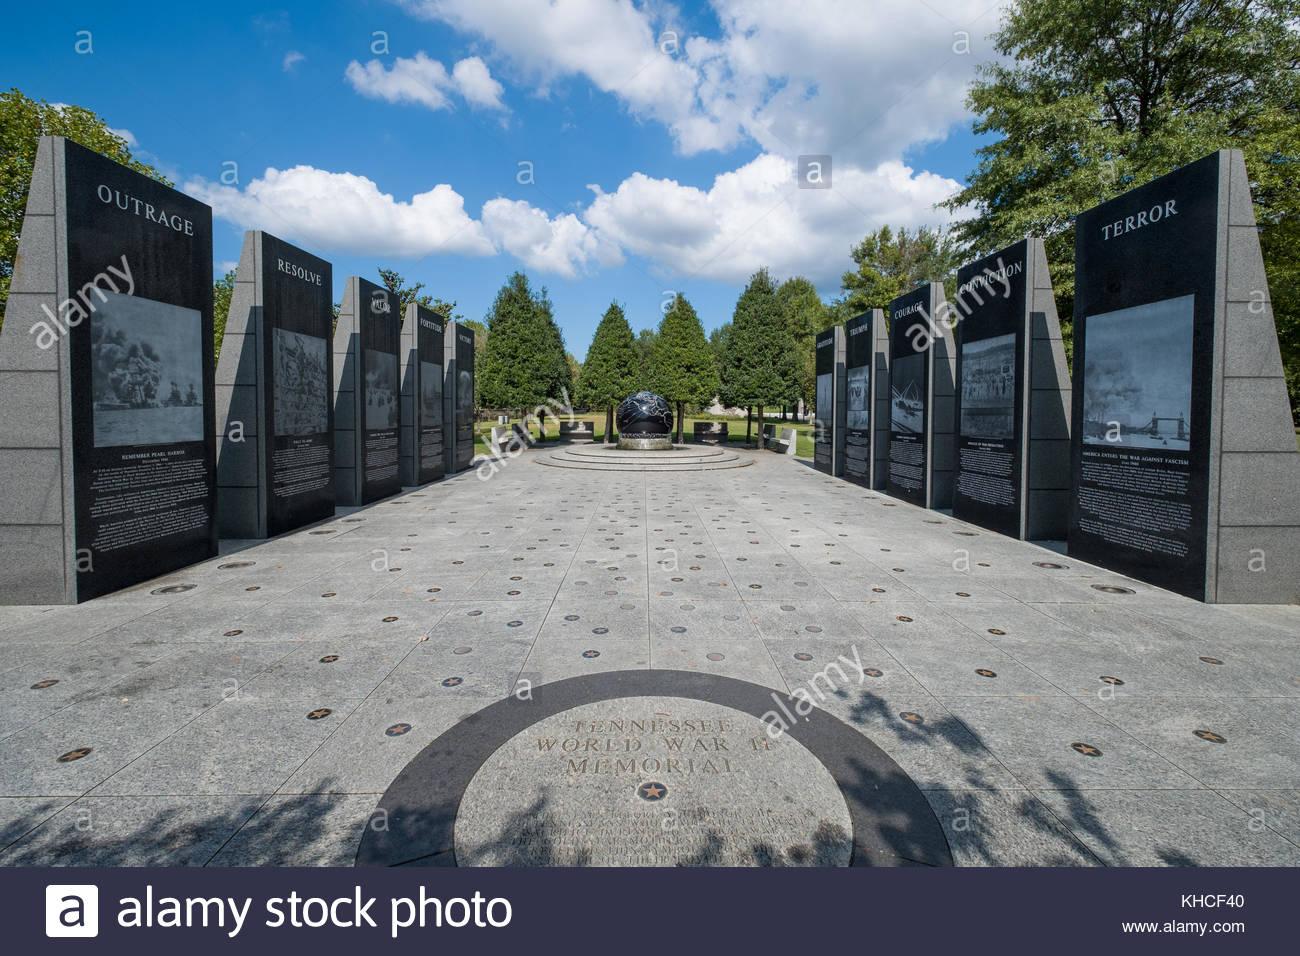 World War II Memorial, Bicentennial Capitol Mall State Park, Nashville, Davidson County, Tennessee, USA Stock Photo